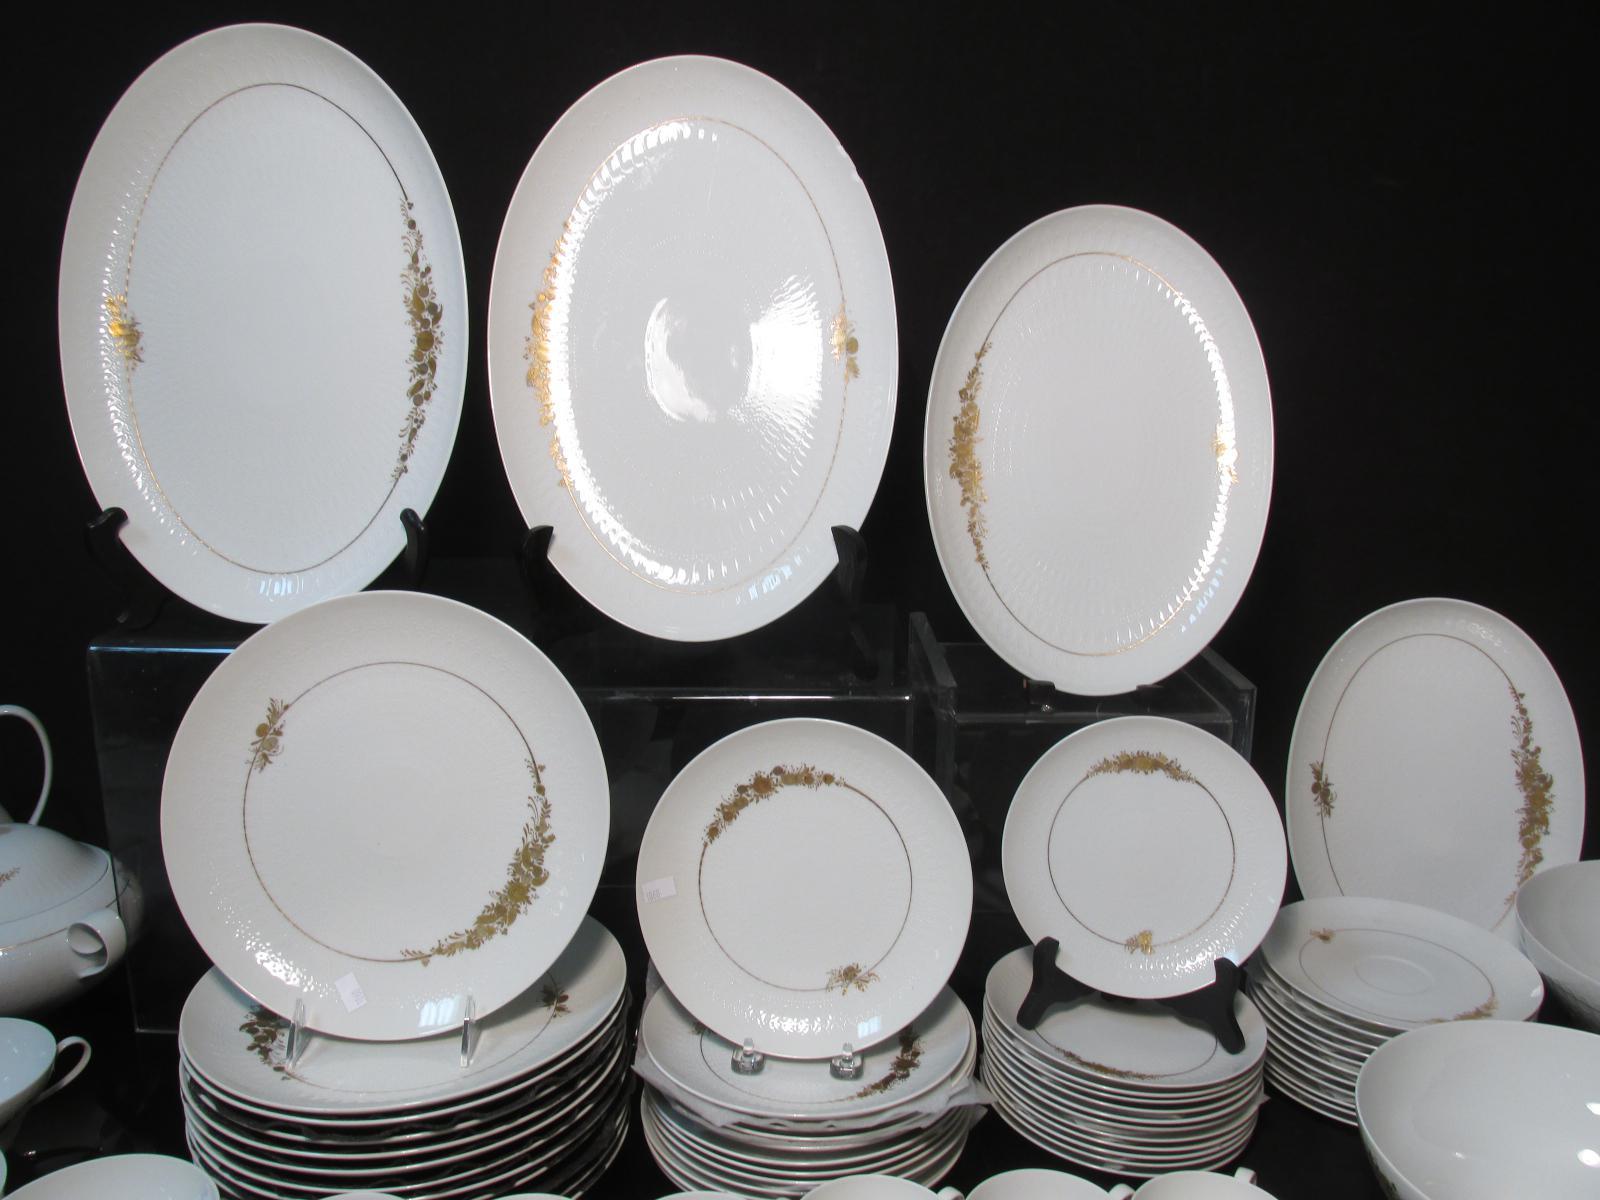 \ Romance Medley\  Bjorn Wiinblad for Rosenthal Dinnerware - Image 5 of 11. \   sc 1 st  Chairish & Romance Medley\